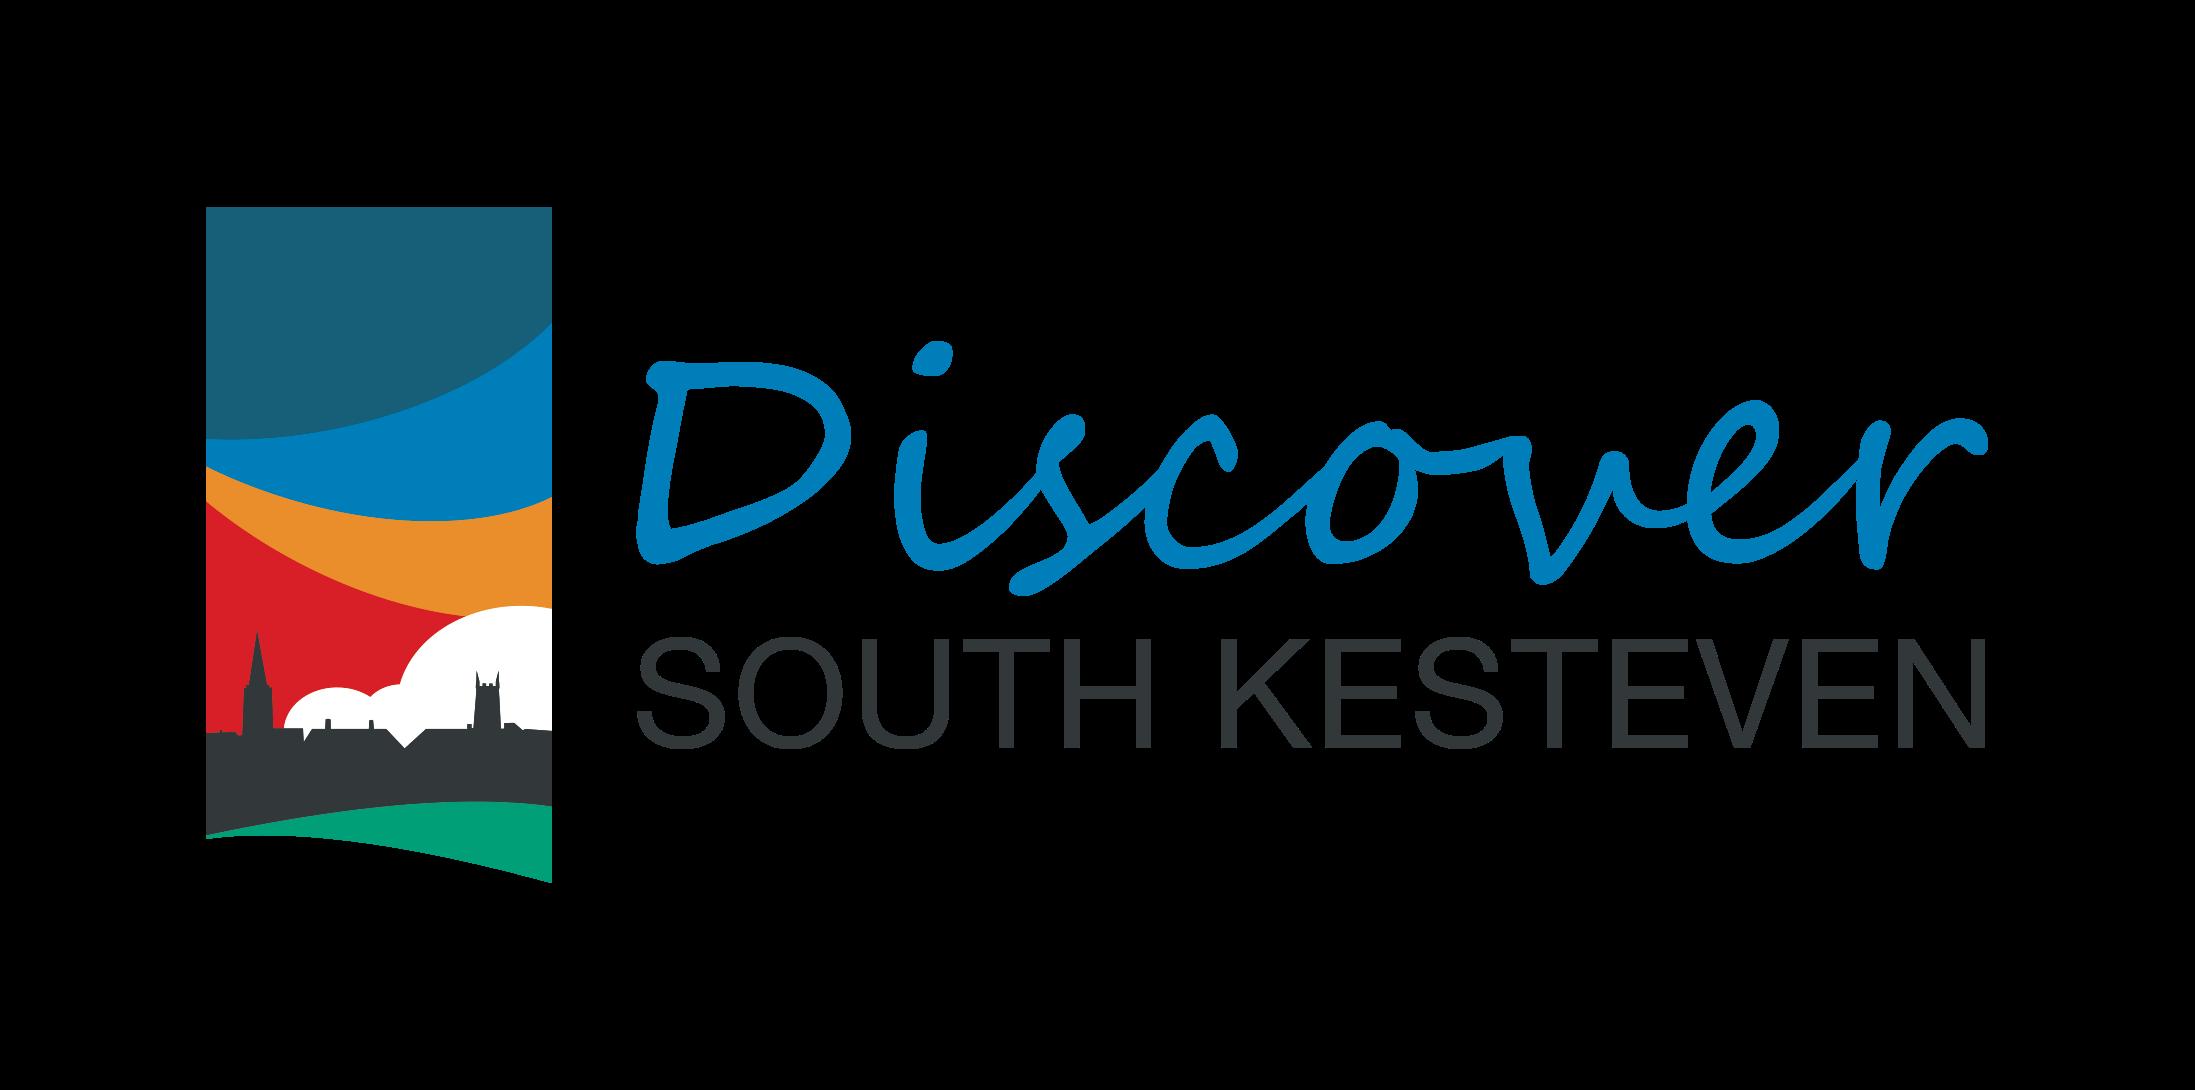 Discover South Kesteven